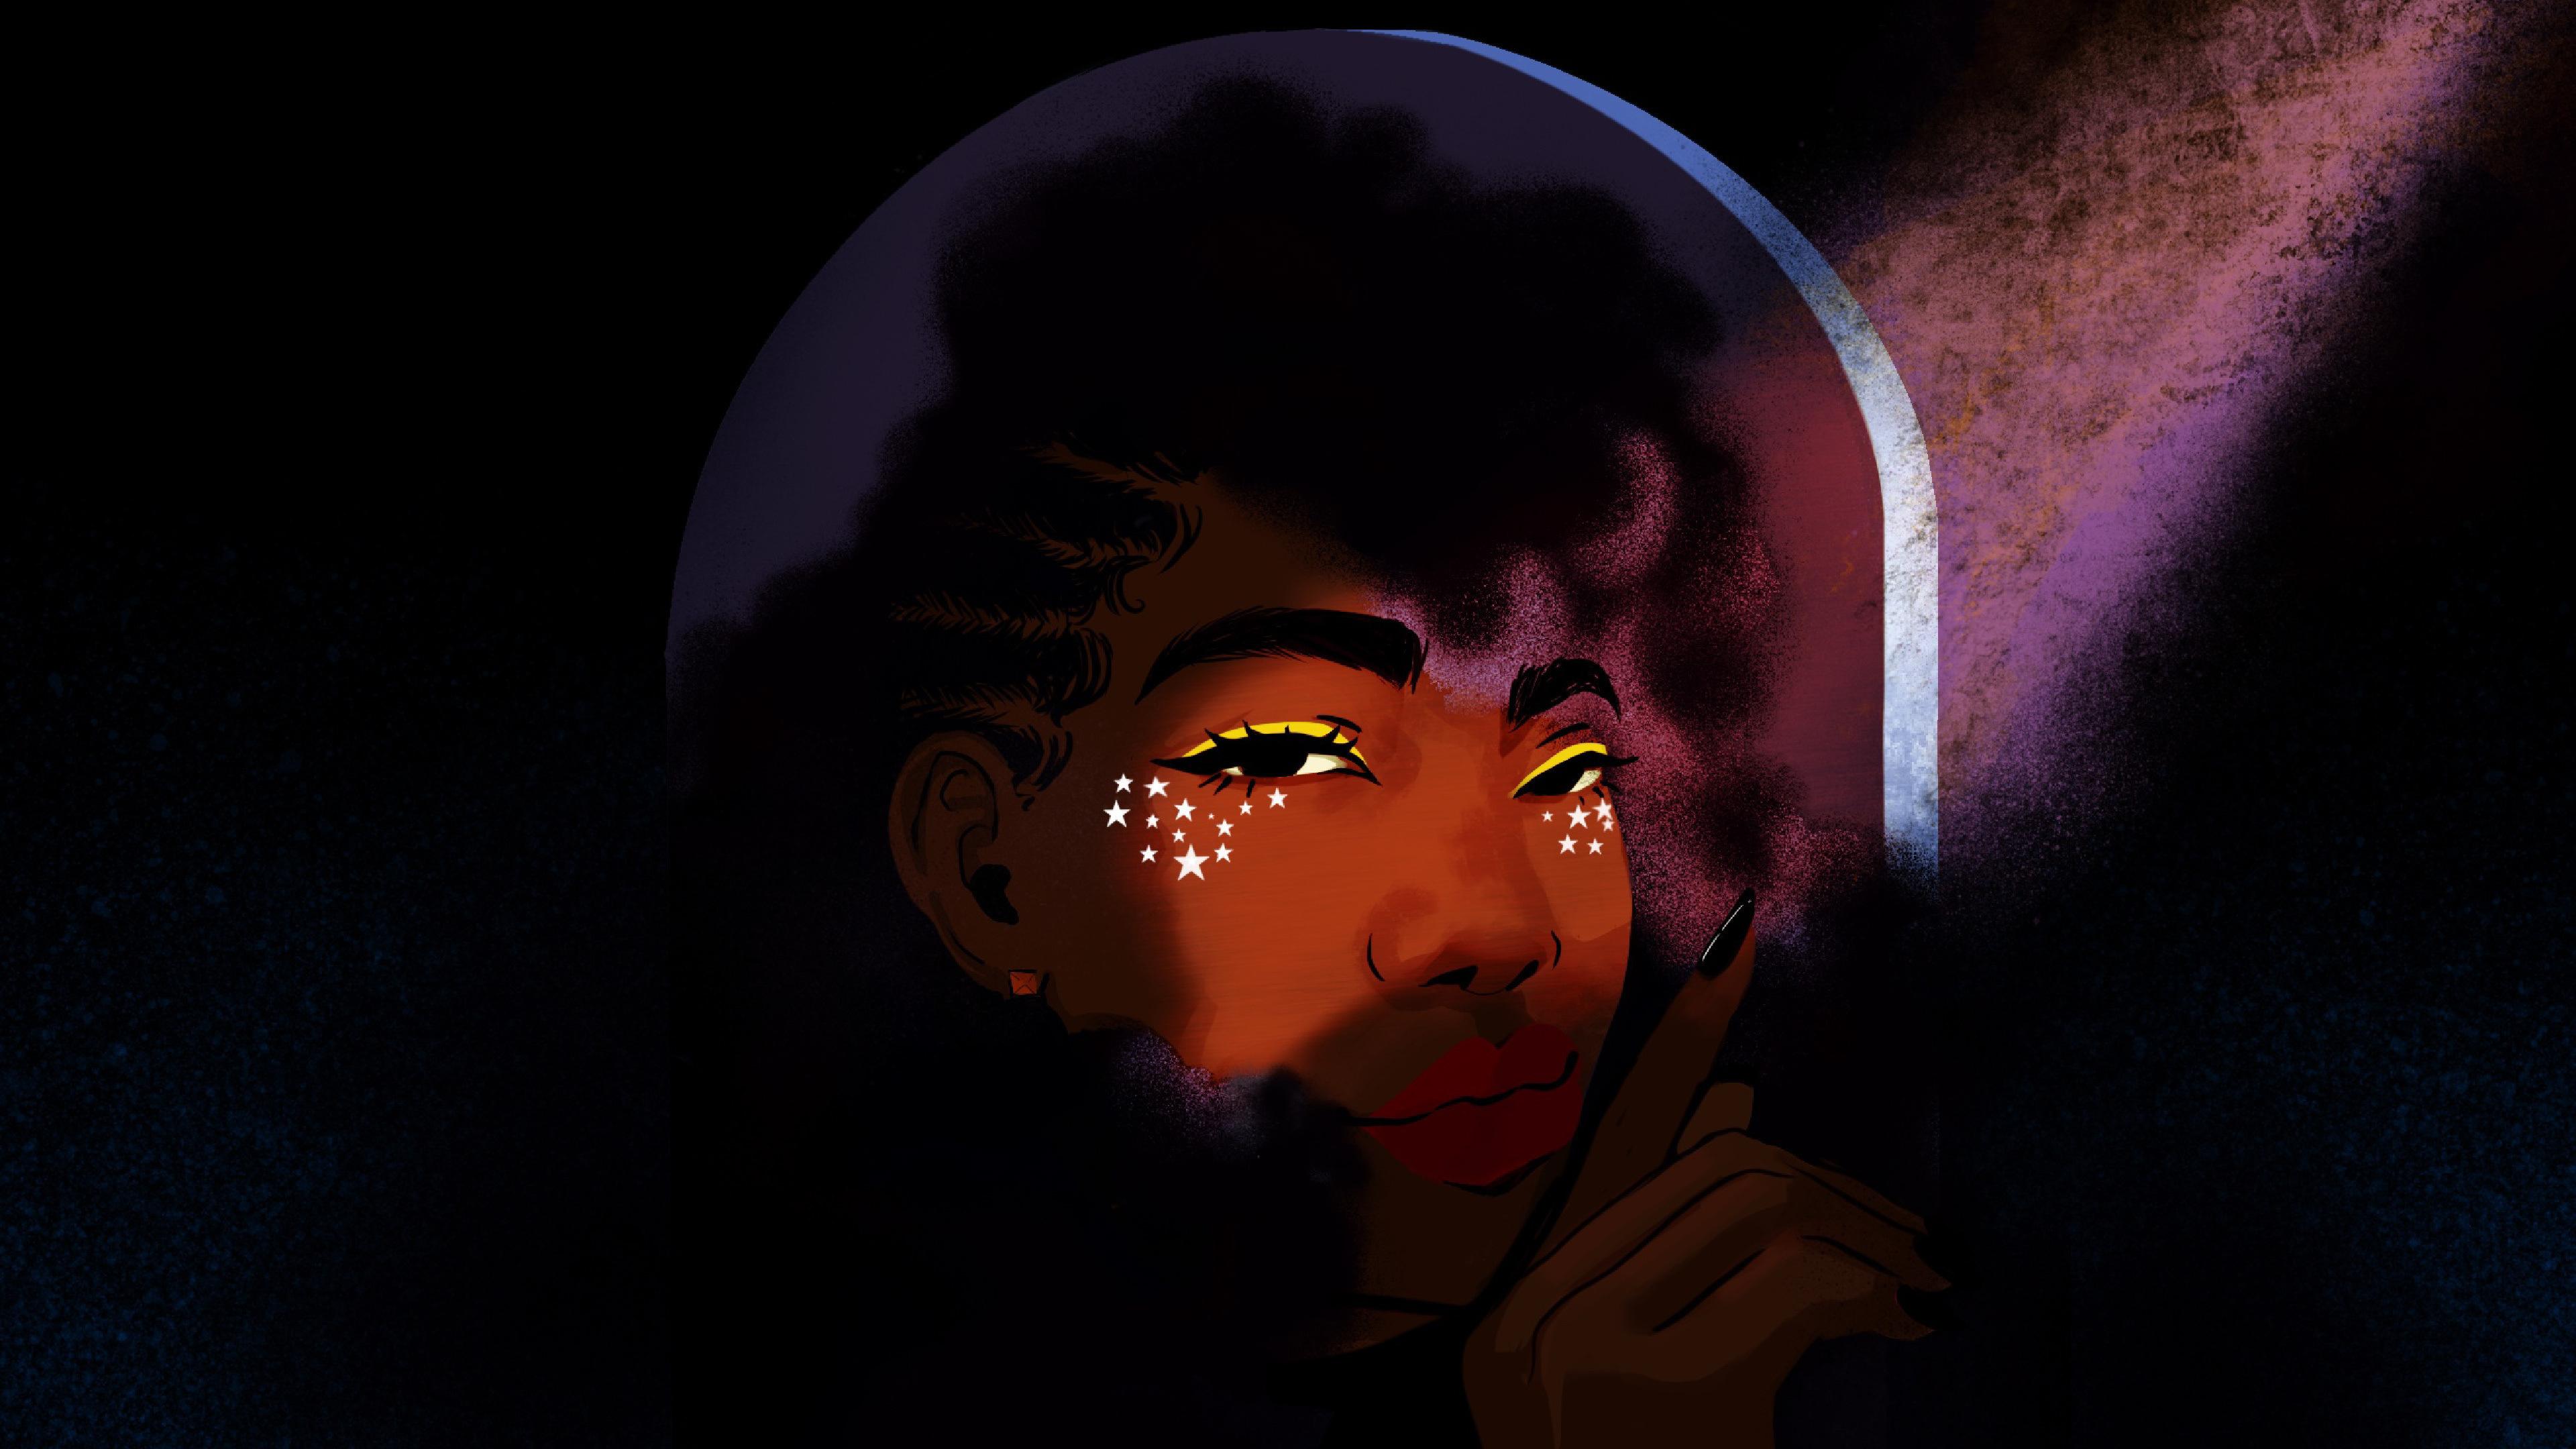 Illustration by Laetitia Auguste